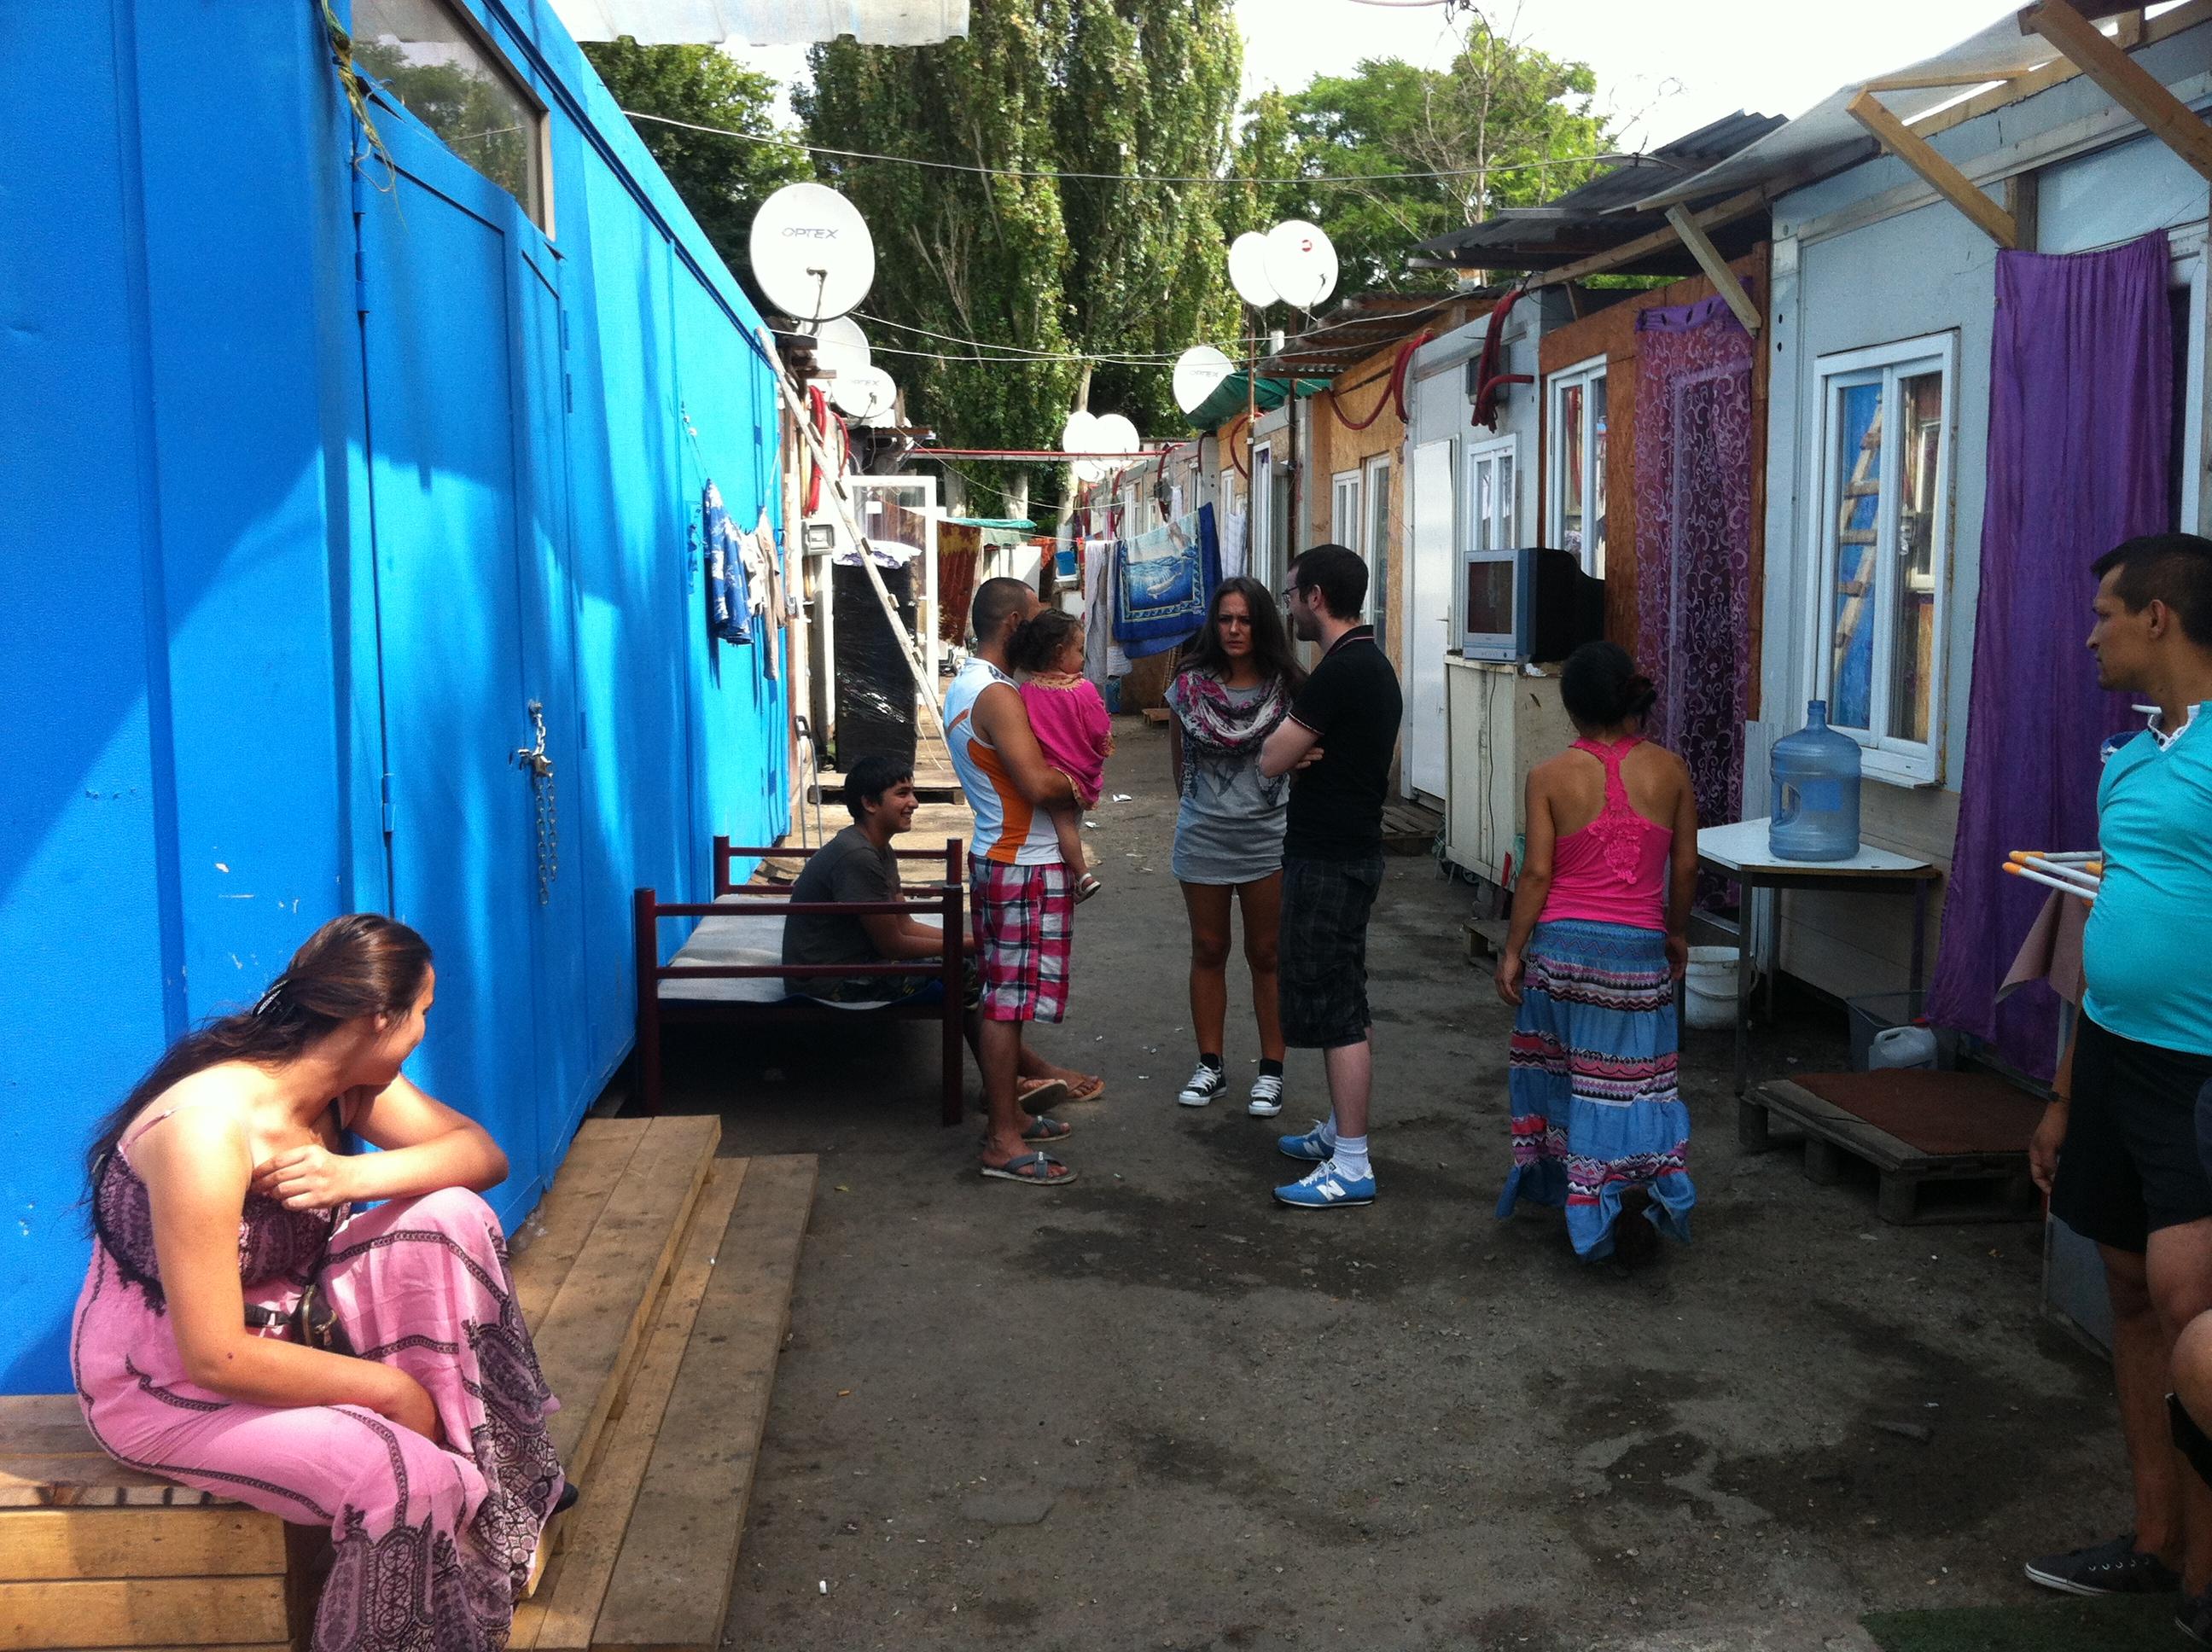 Saint Denis si cele 55 de familii de rromi